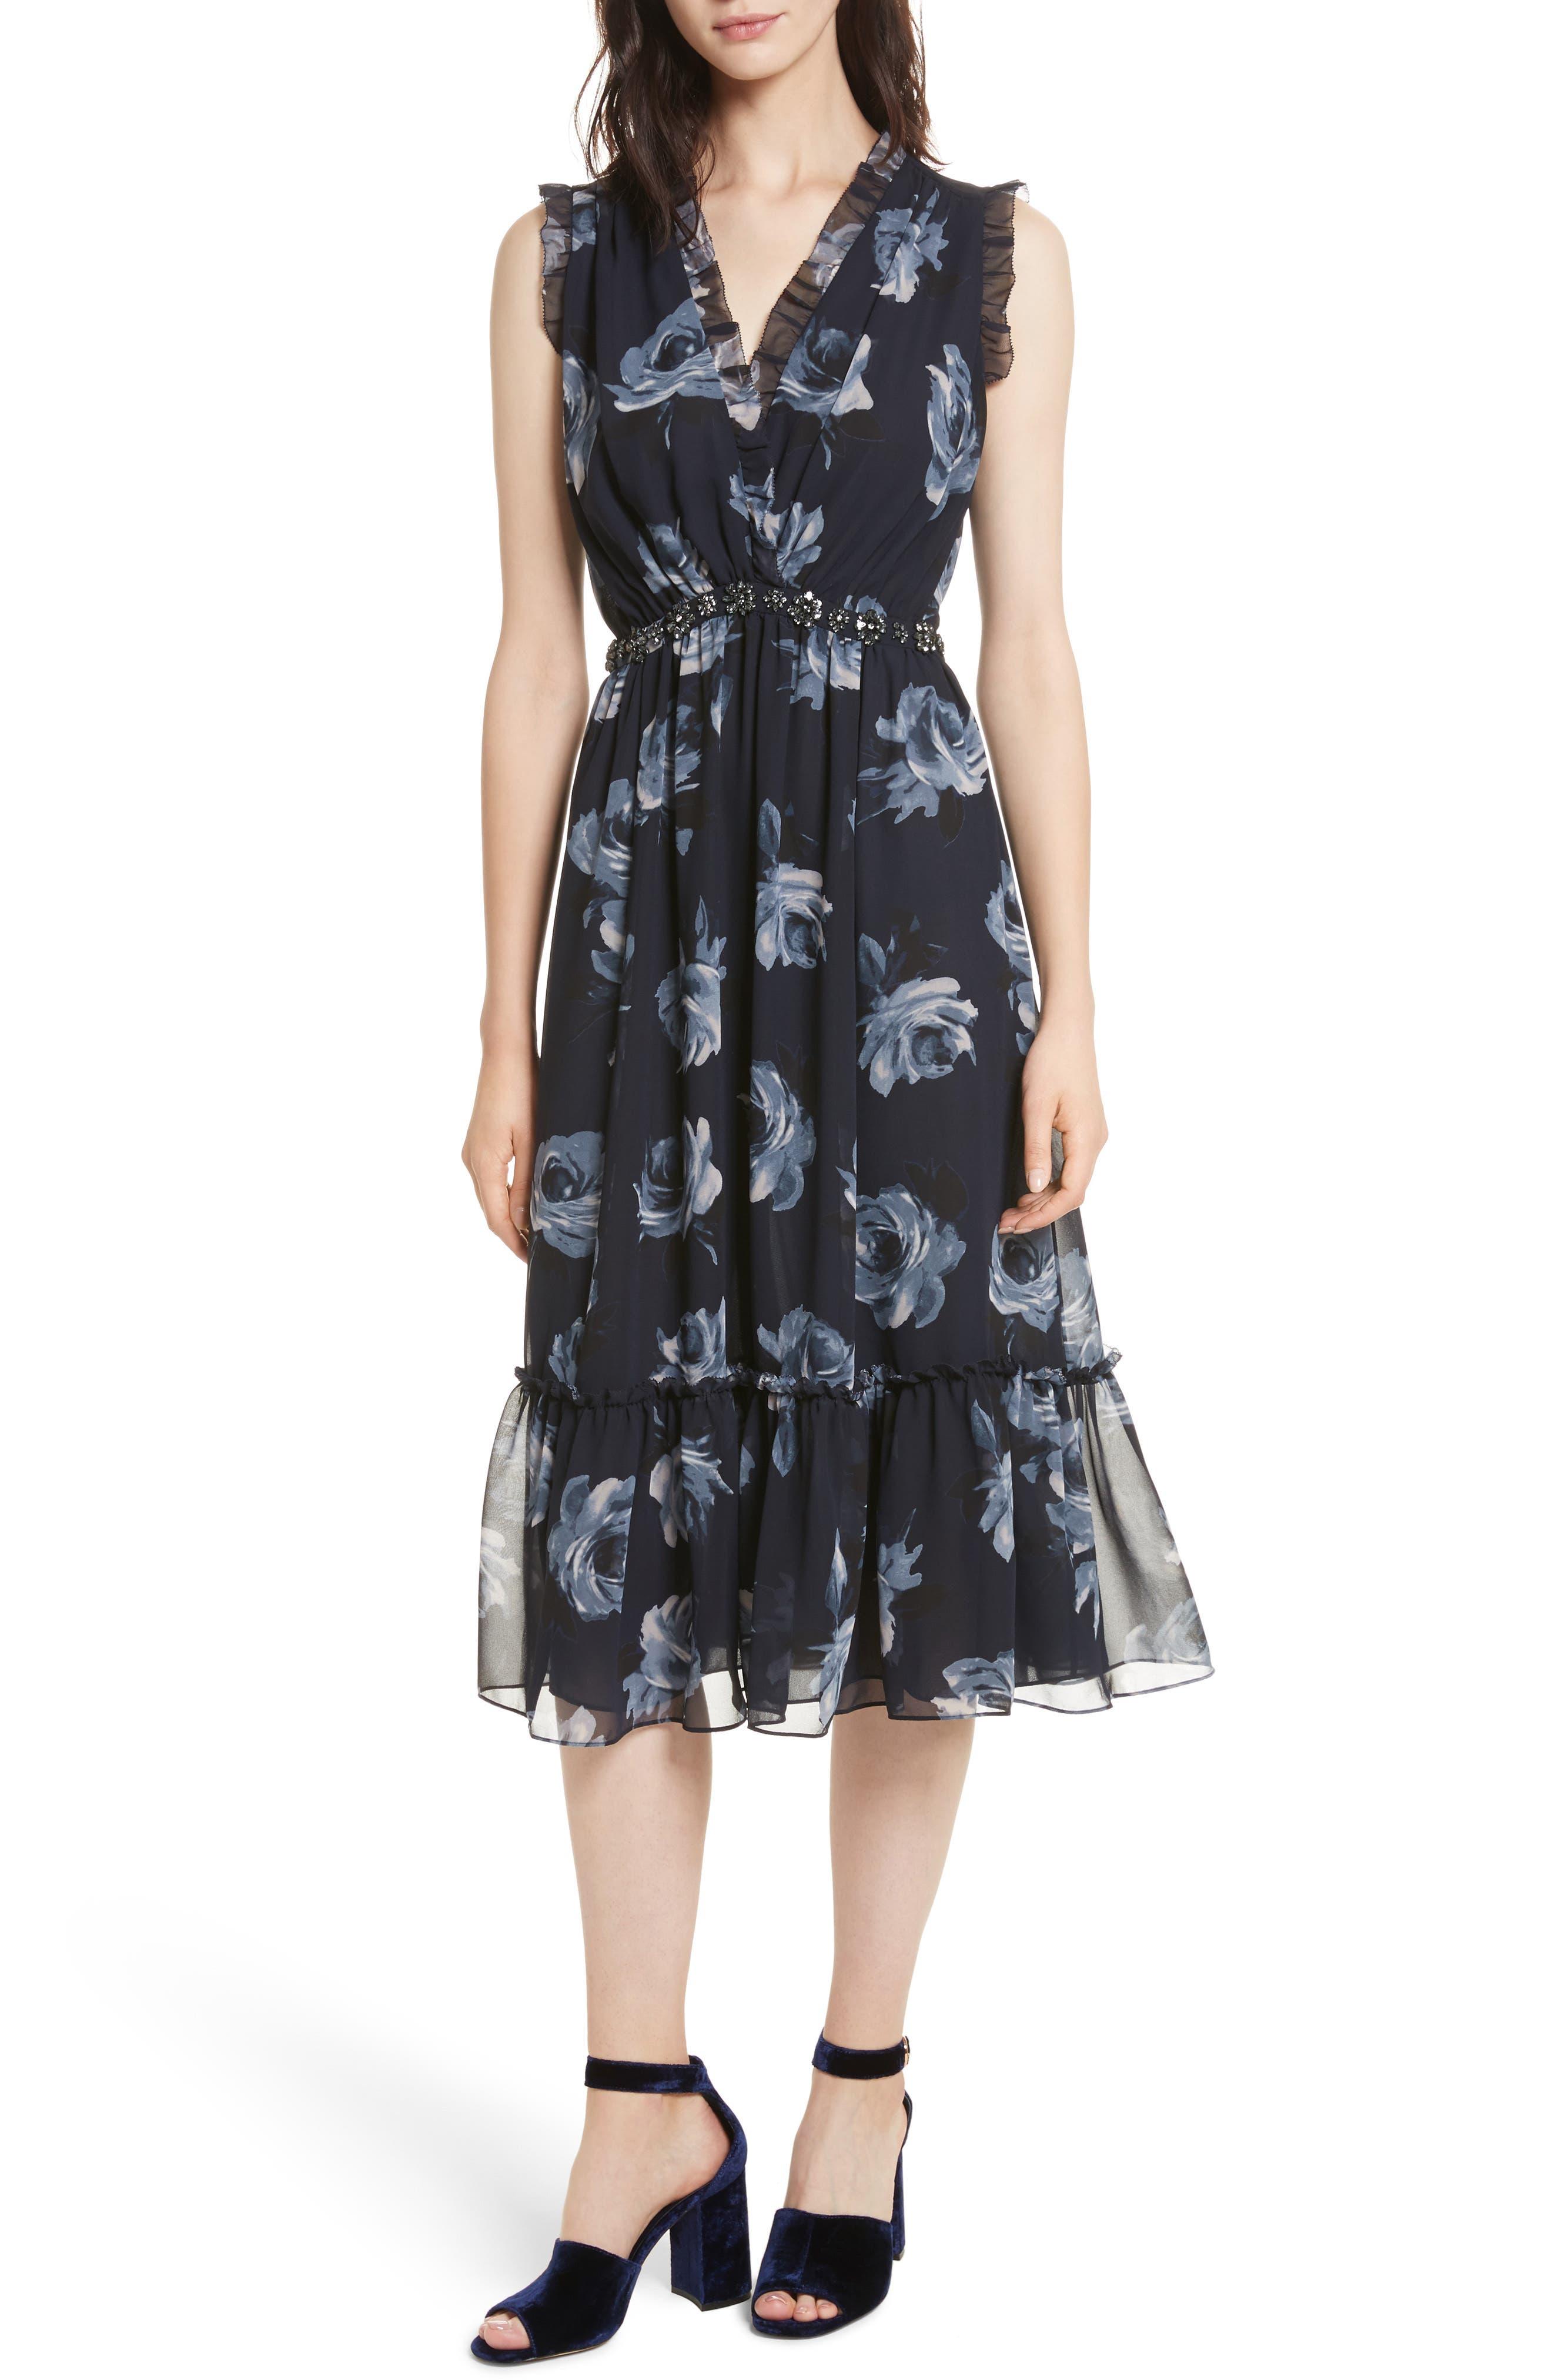 Main Image - kade spade new york Night Rose Chiffon Midi Dress